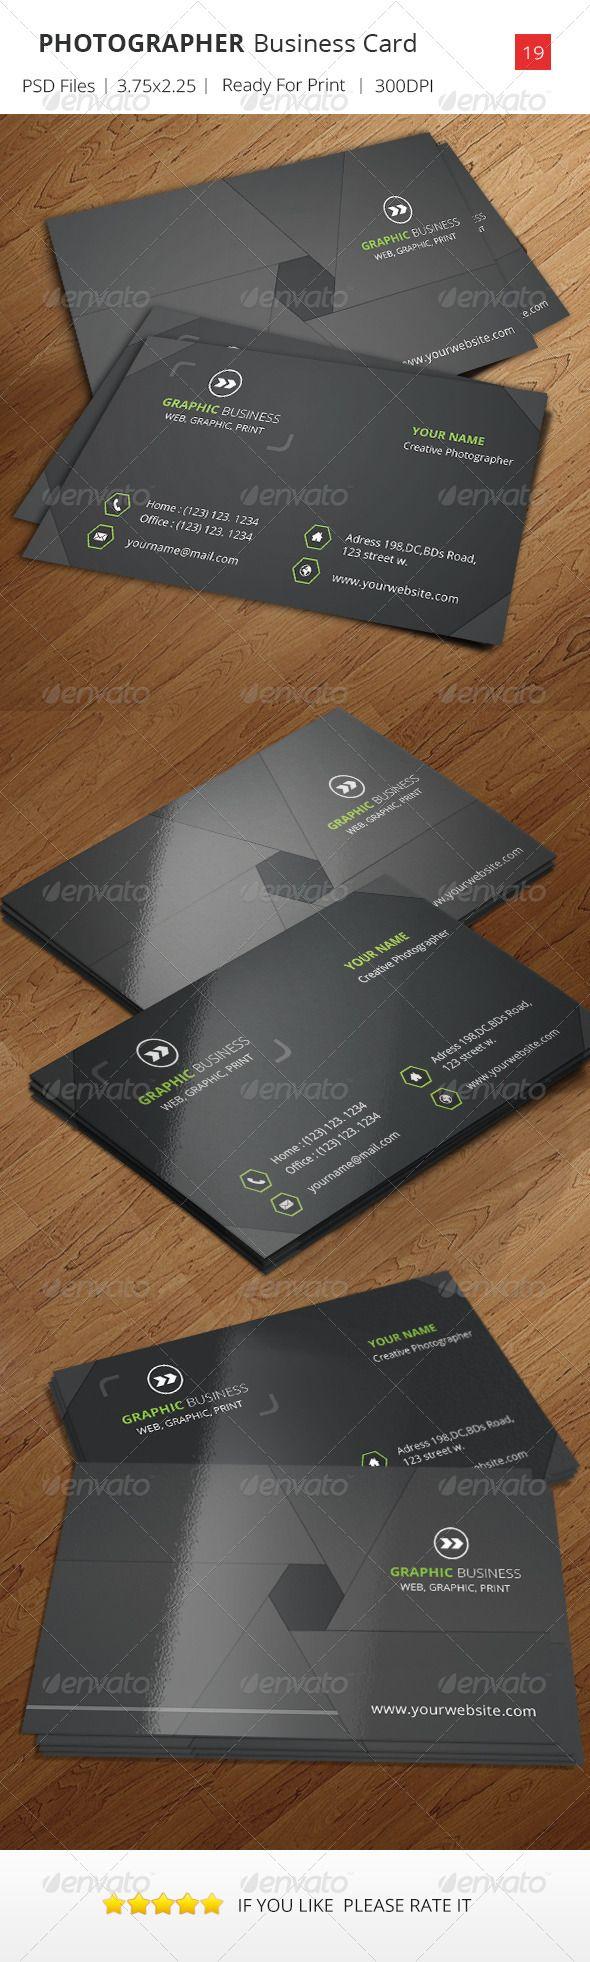 Photographer business card v19 business card pinterest photographer business card v19 reheart Choice Image